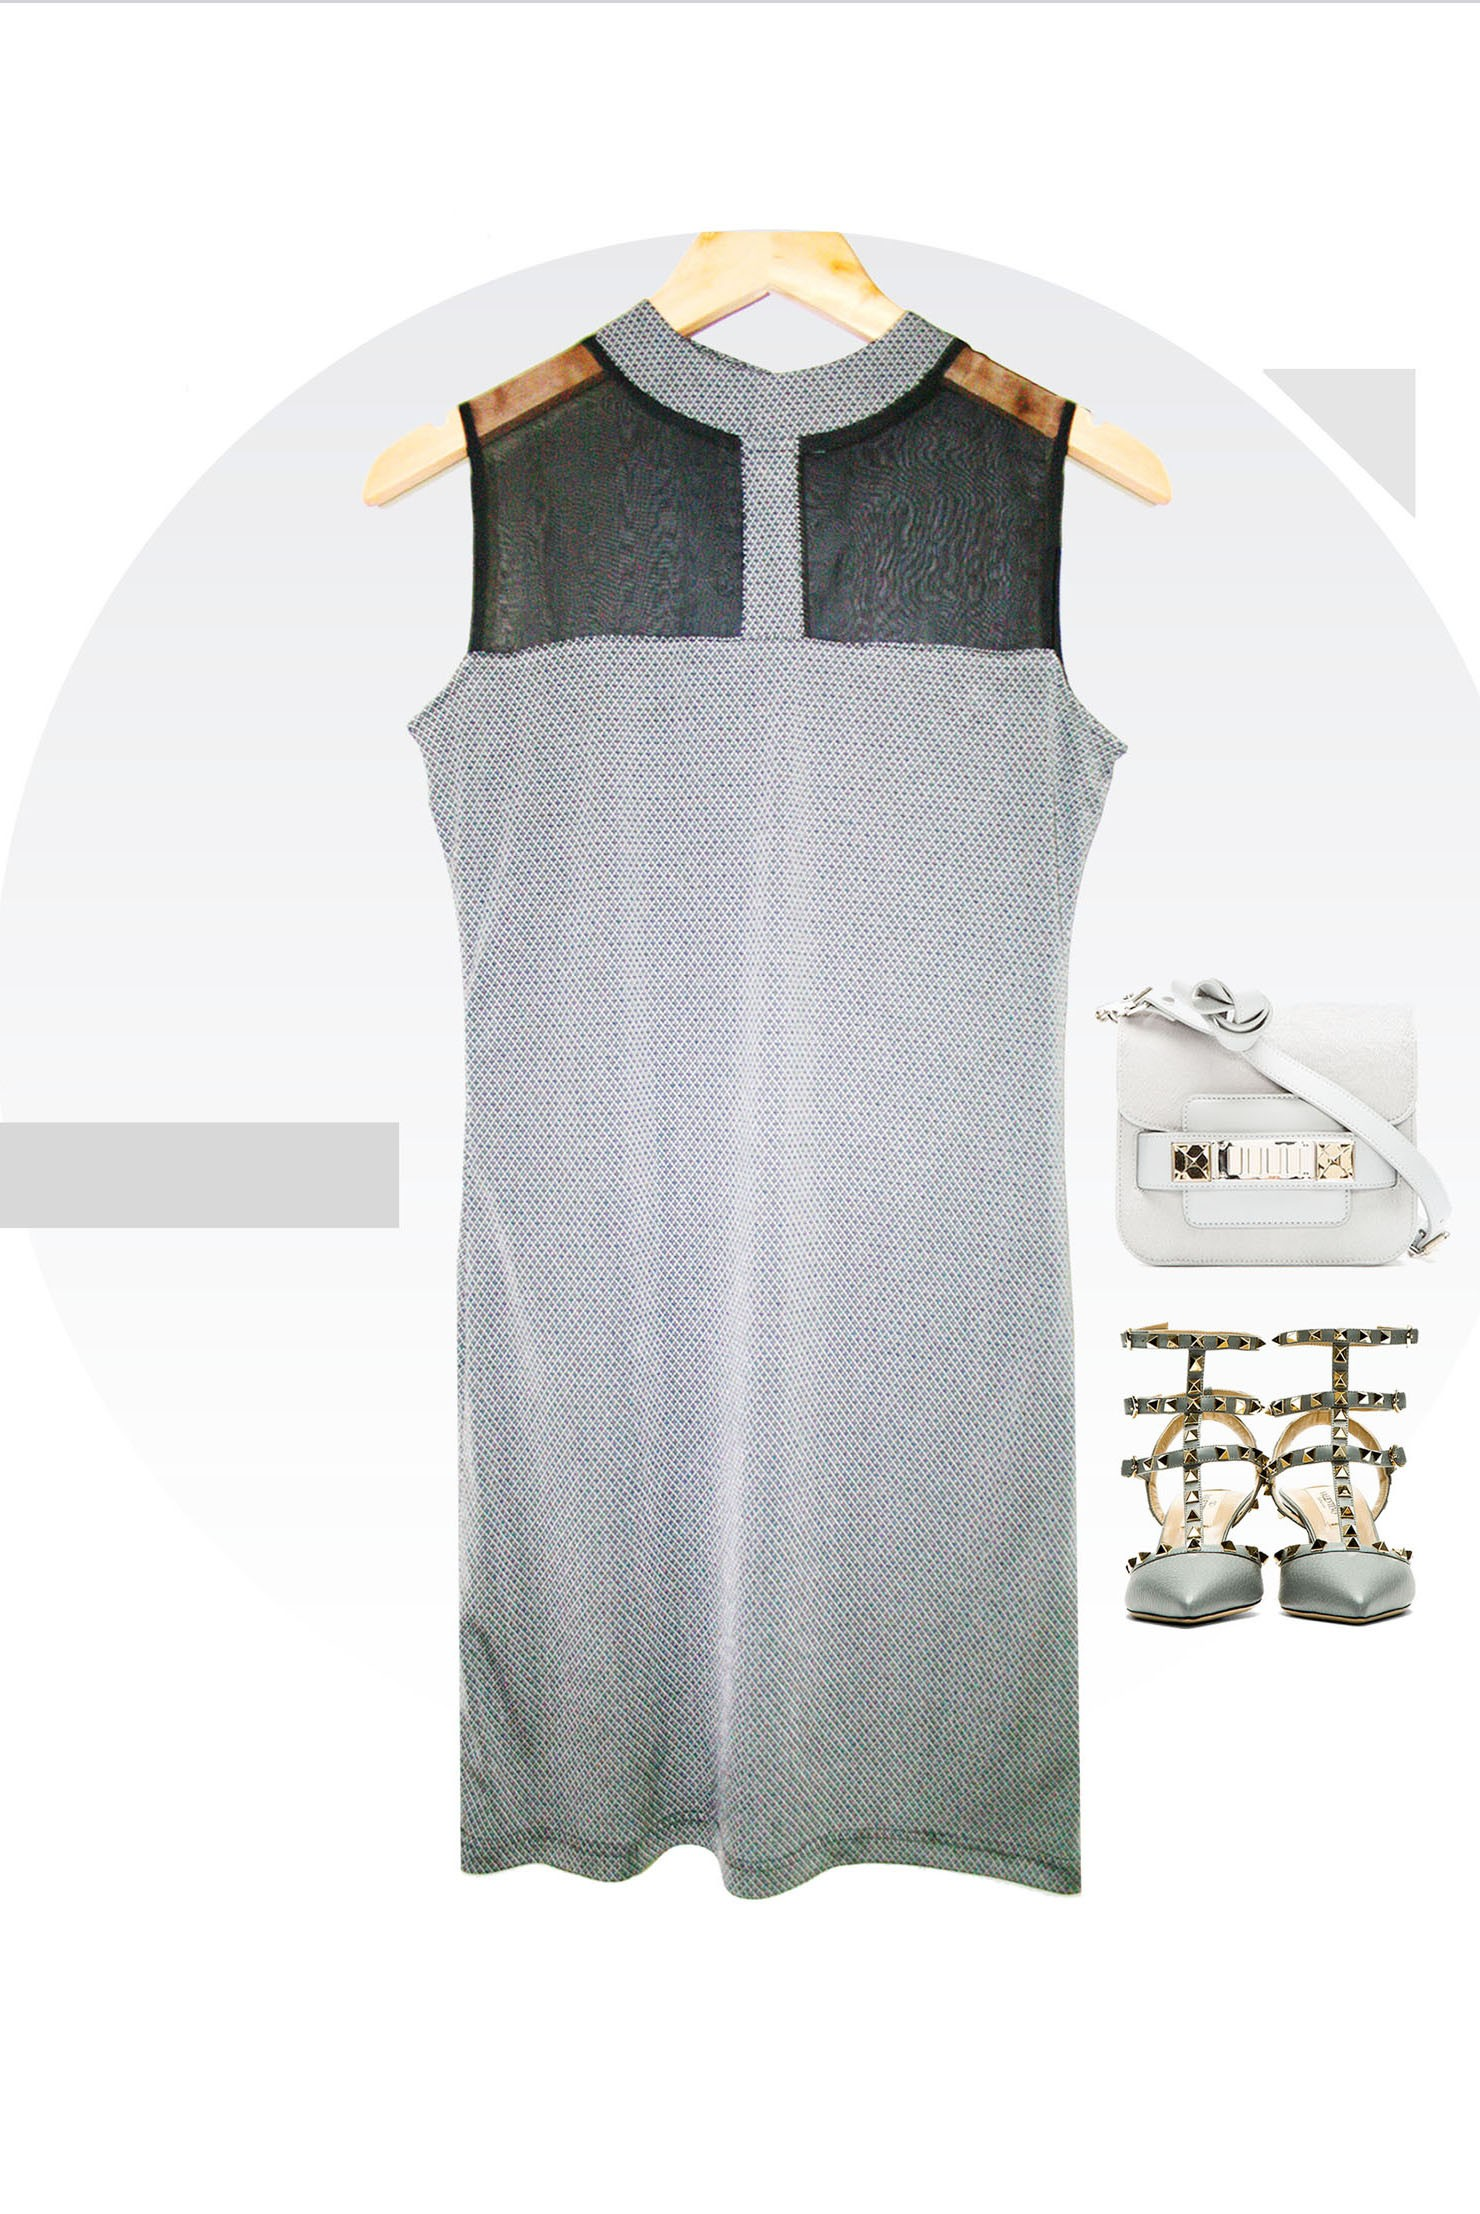 Sheer Panel Shift Dress - WD13002